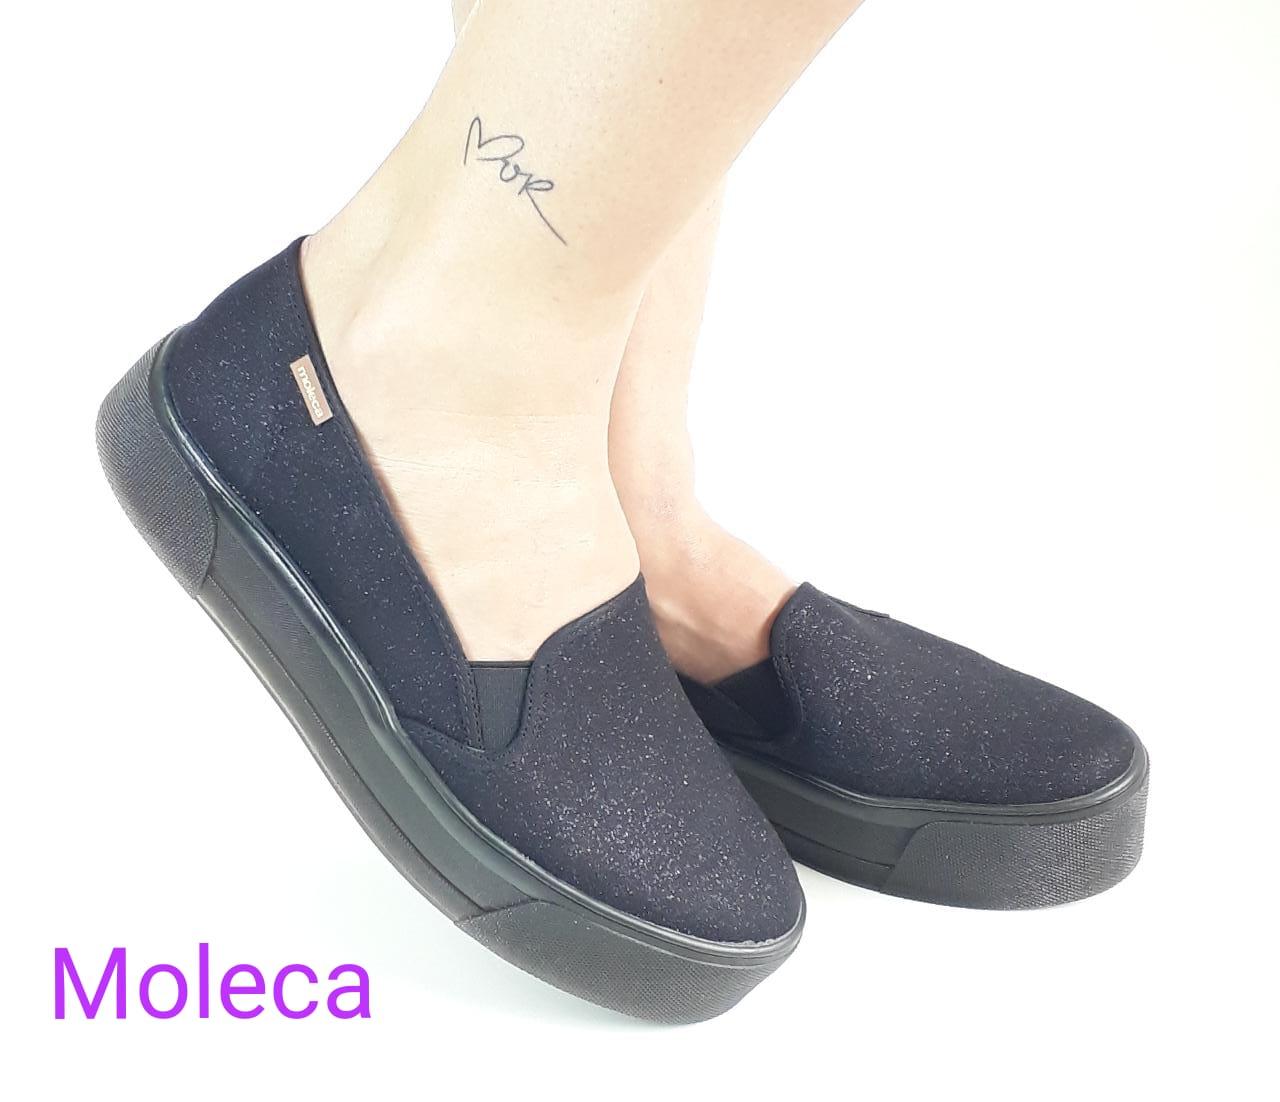 Slipper Moleca